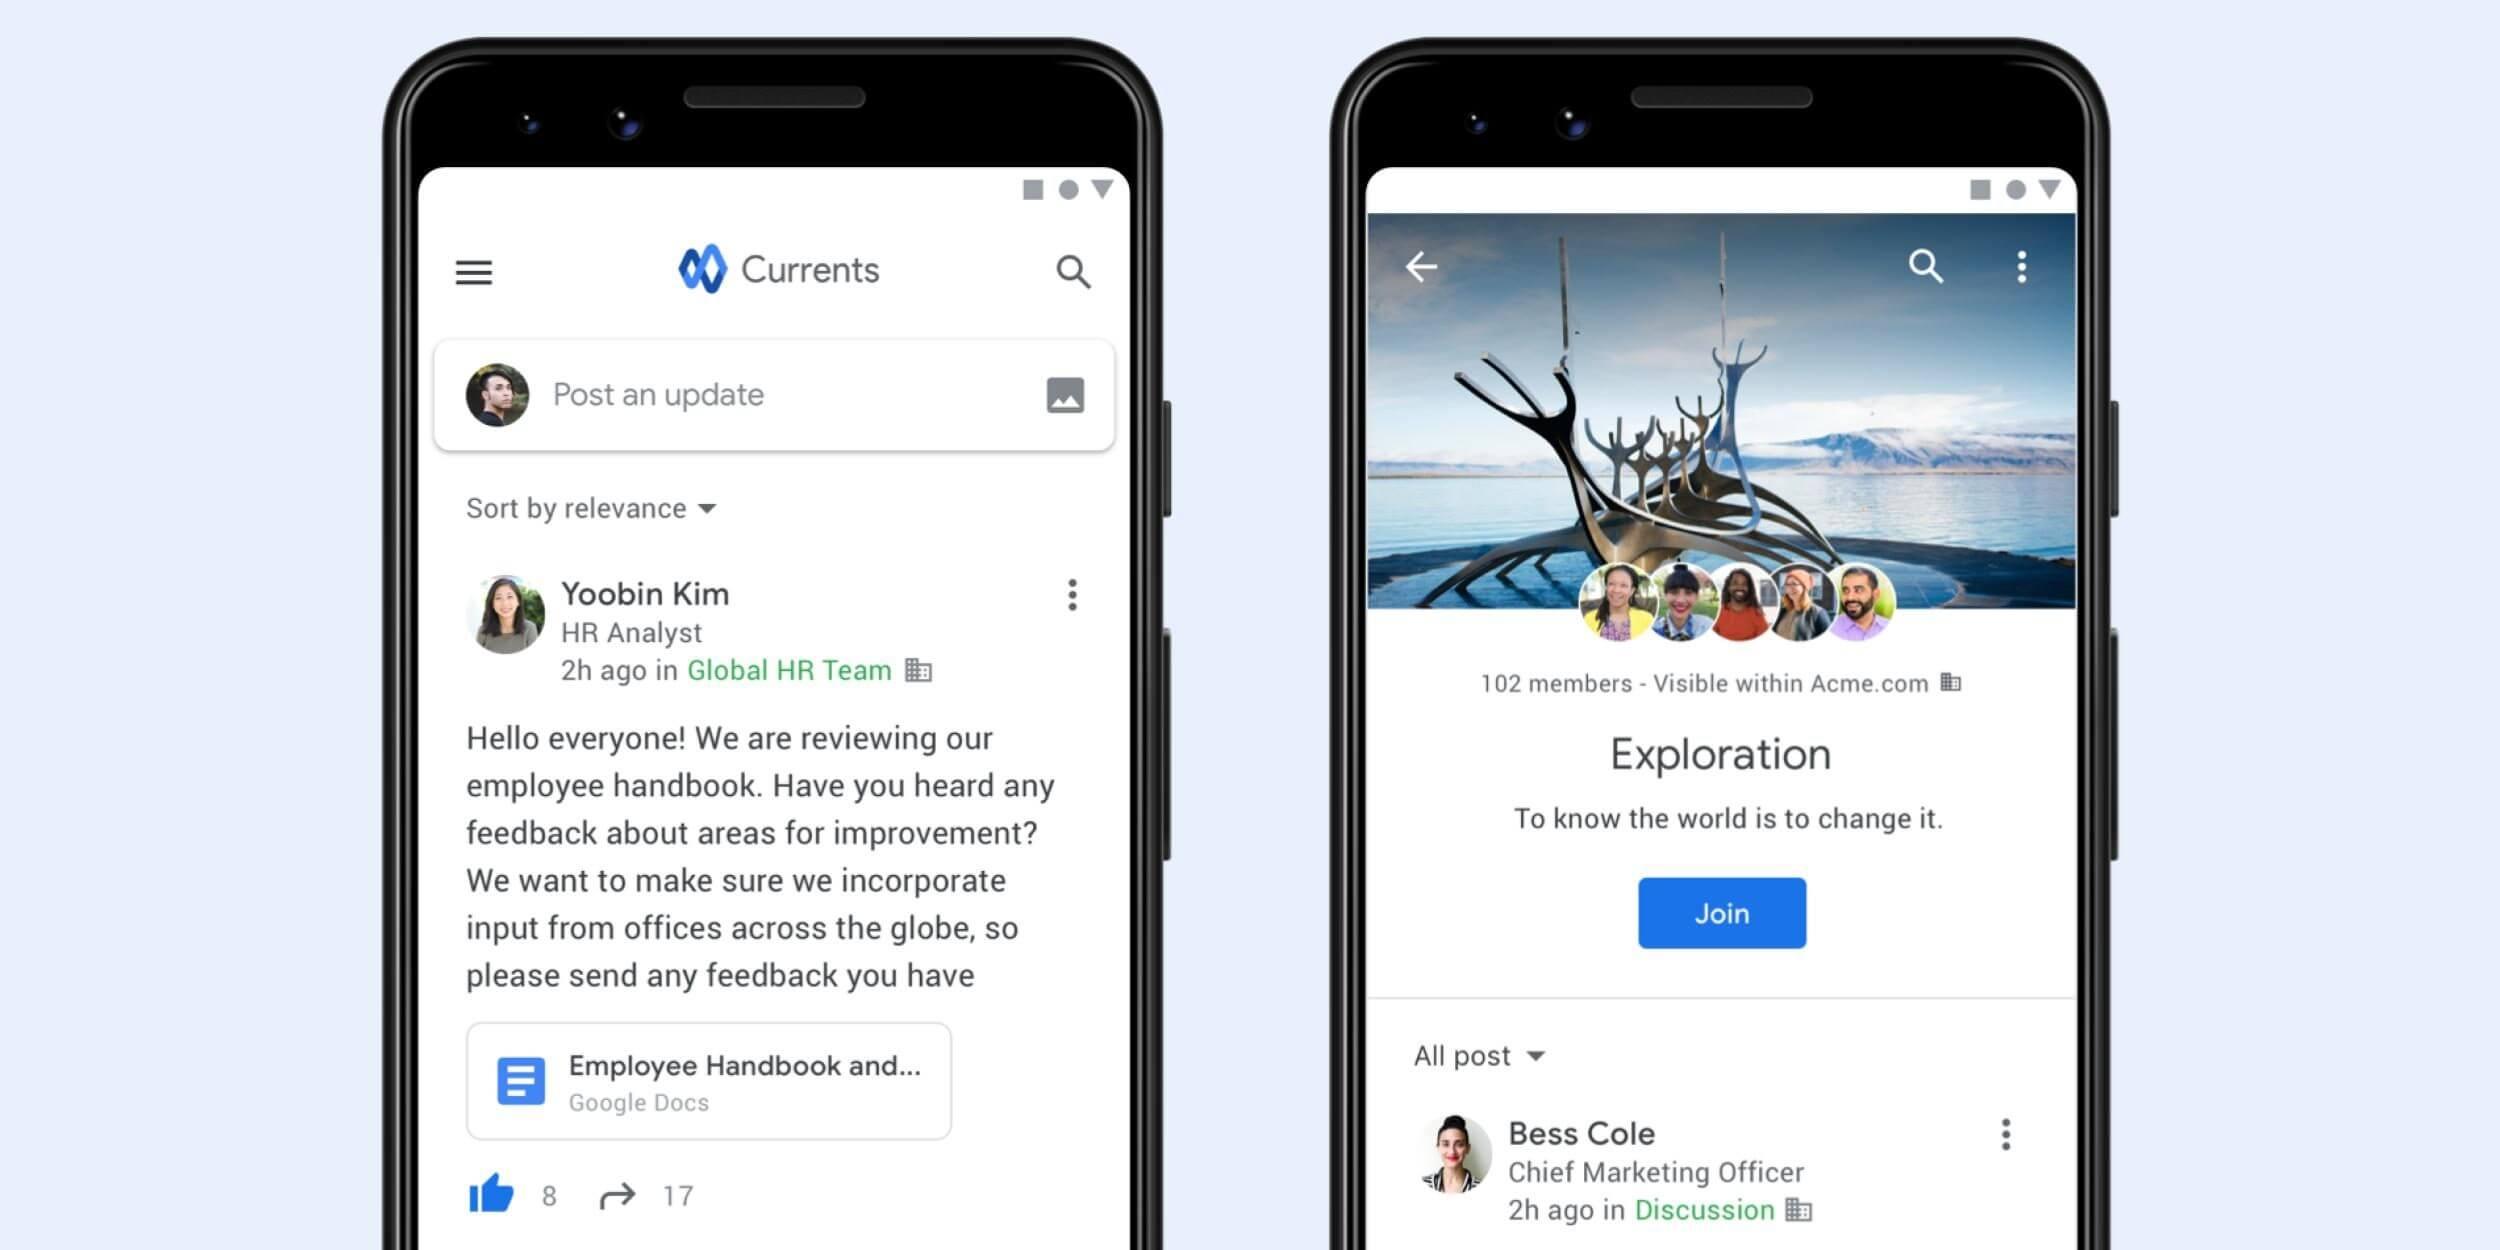 google-currents-su-smartphone